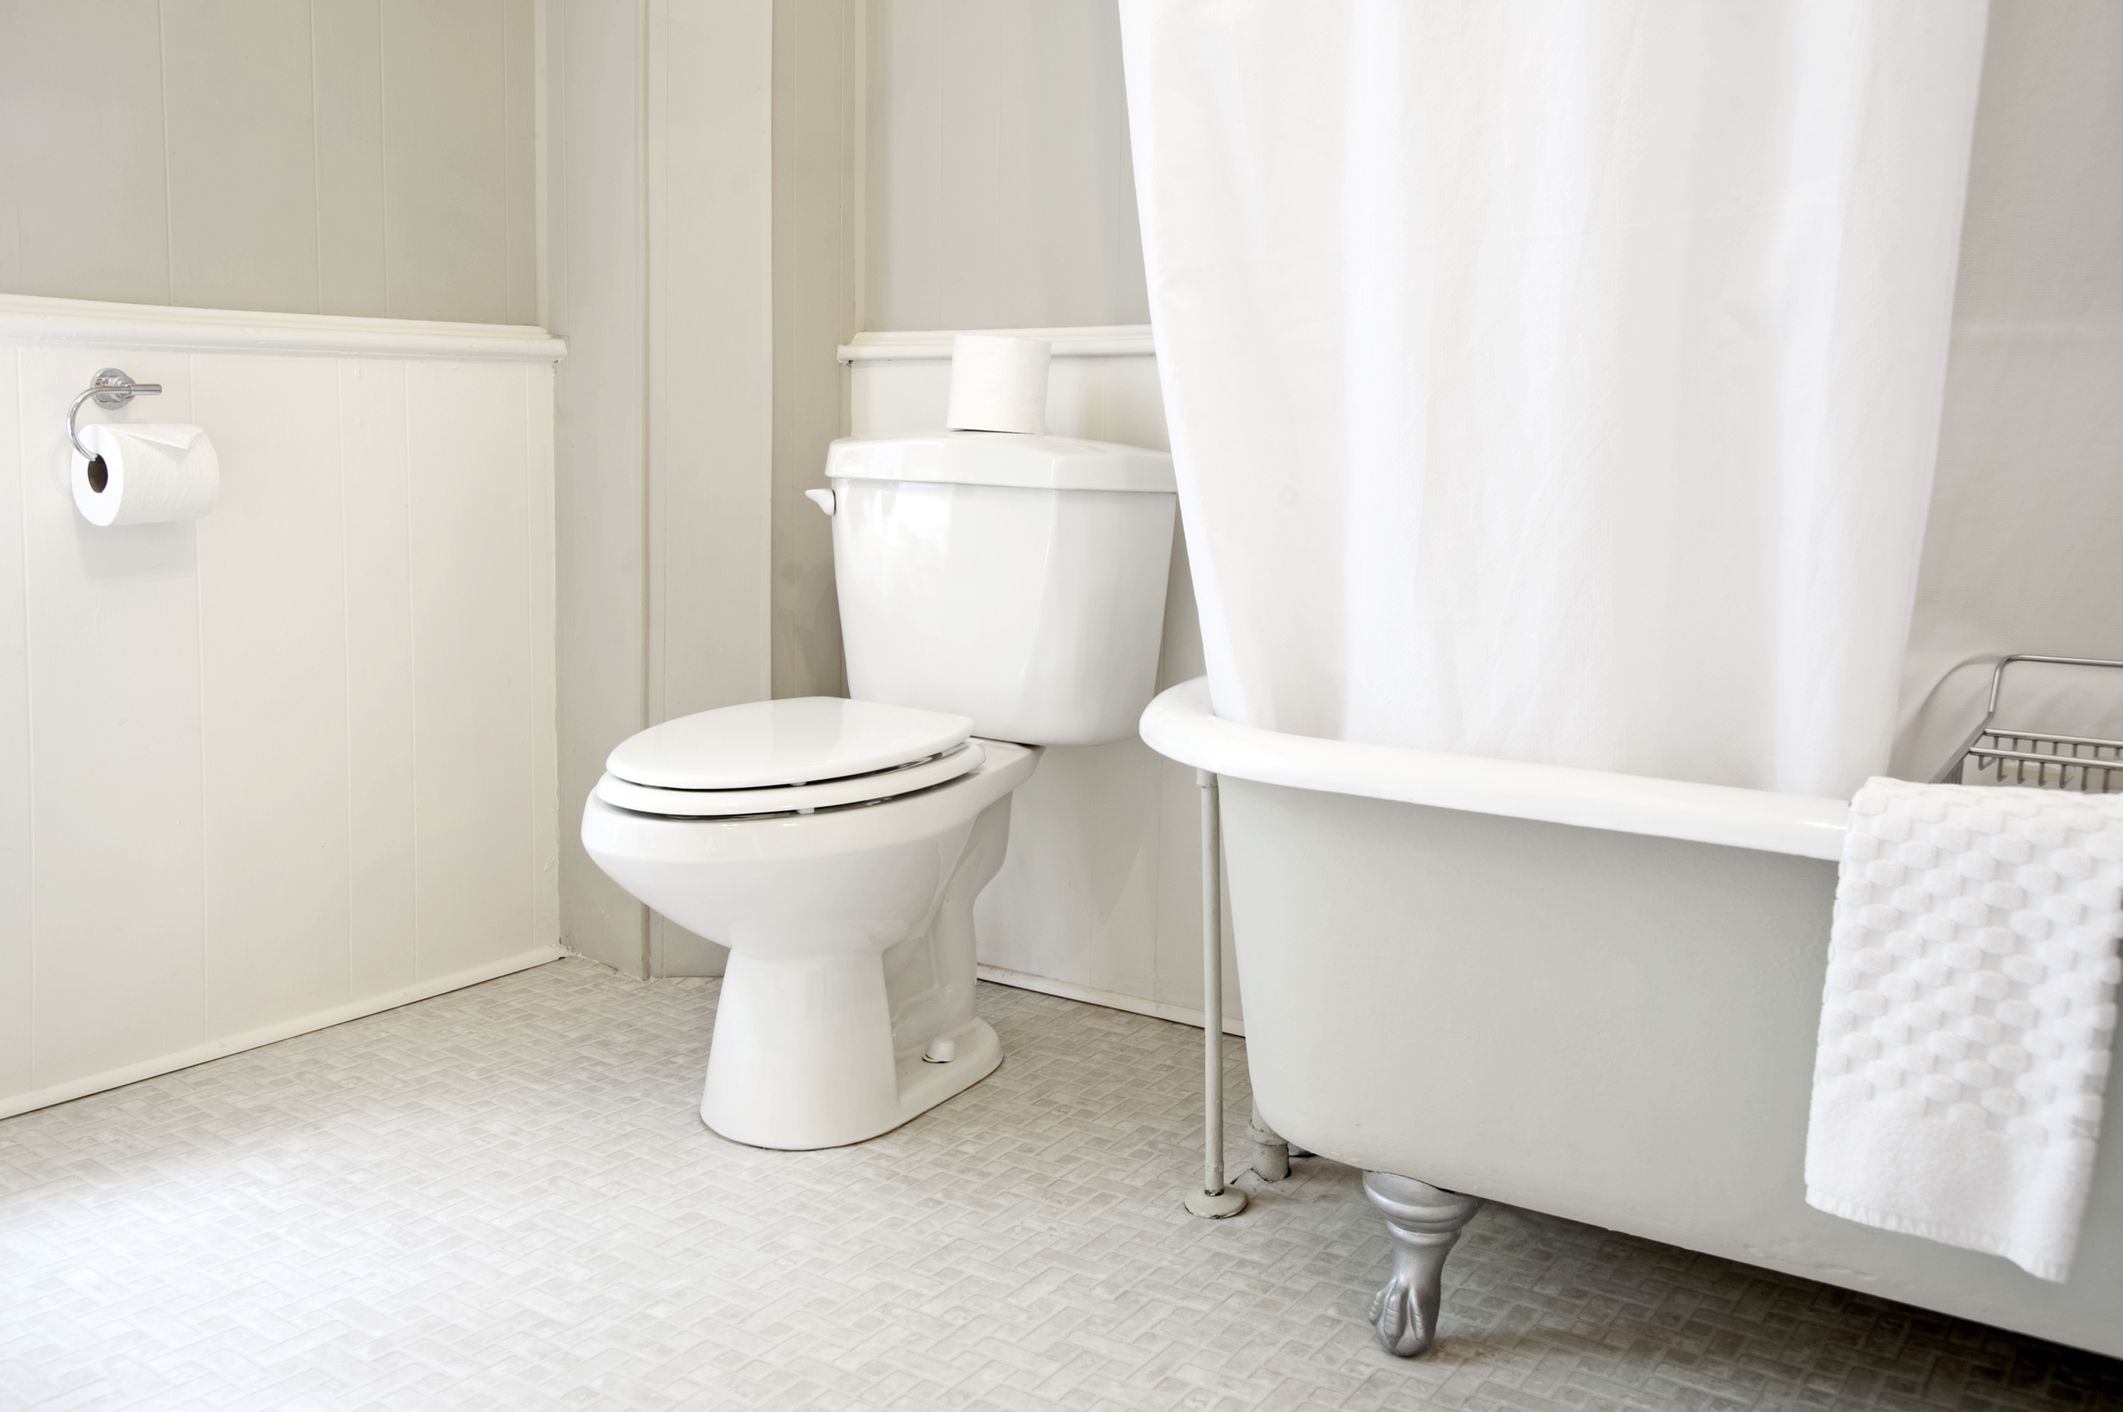 A Bathroom Bathroom Vent Fan Factoids